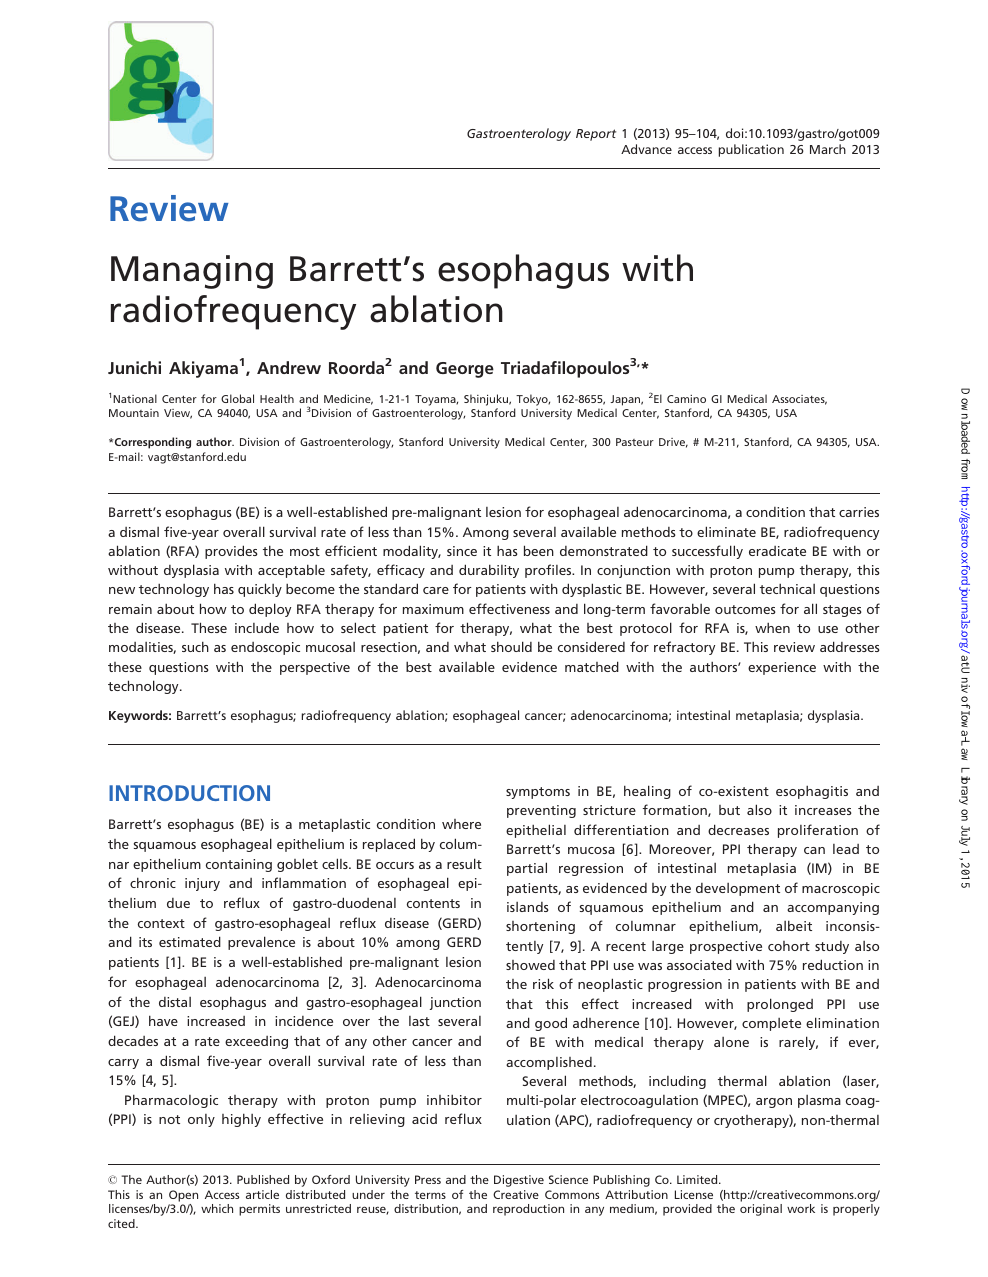 Managing Barrett's esophagus with radiofrequency ablation